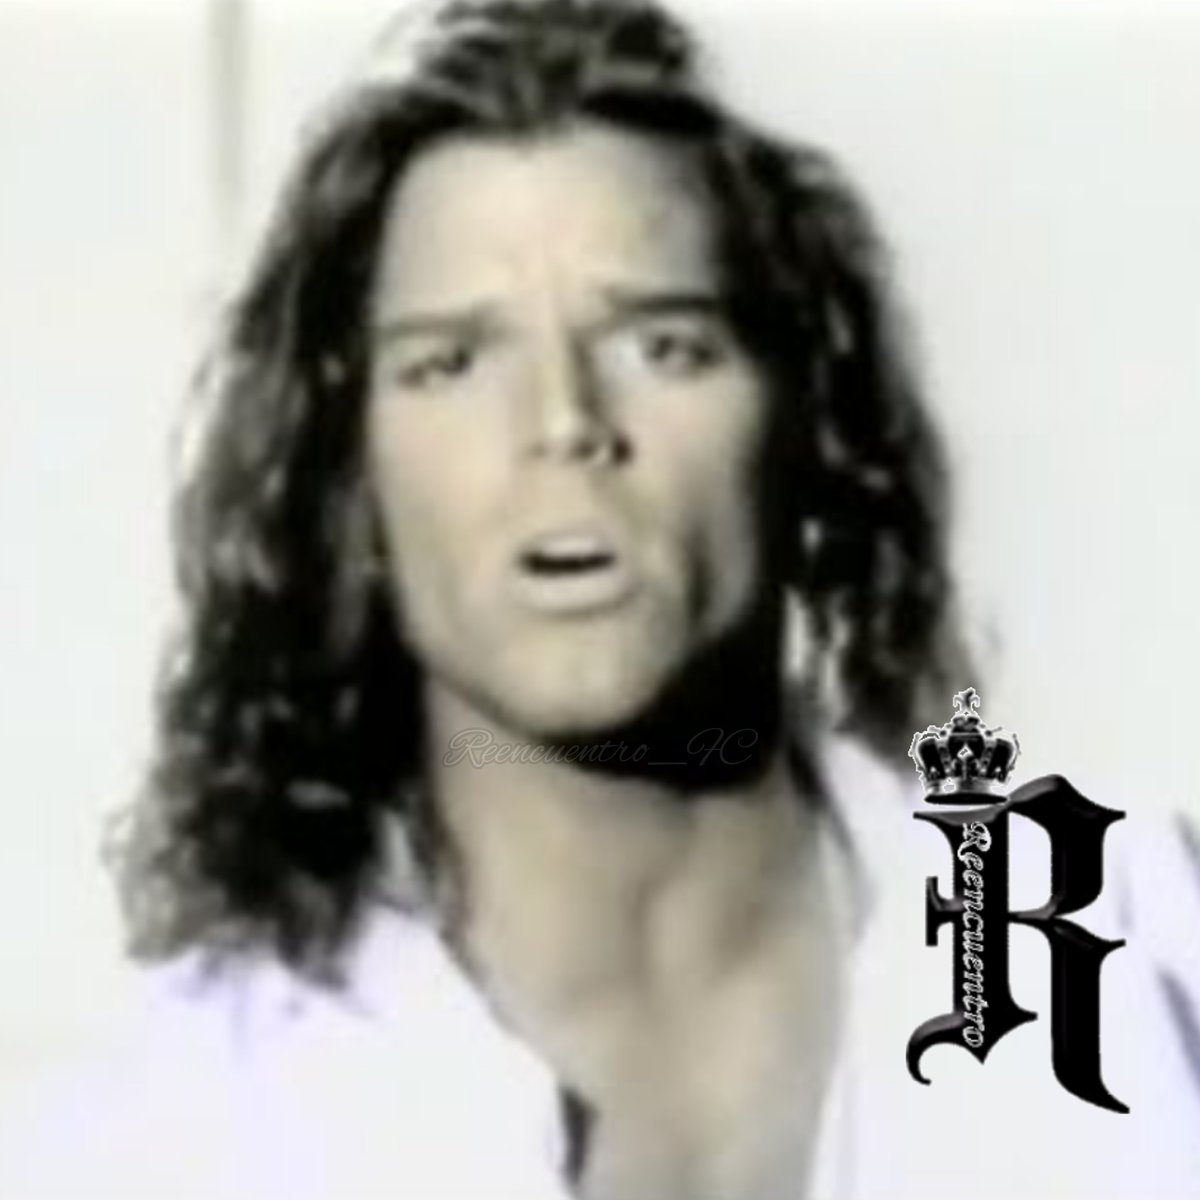 @RMwebteam @InpulseMedia @fc_reencuentro @ricky_martin #RickyMartin #pausaplay #reencuentro_fc #portihagoloquesea #nadienospara